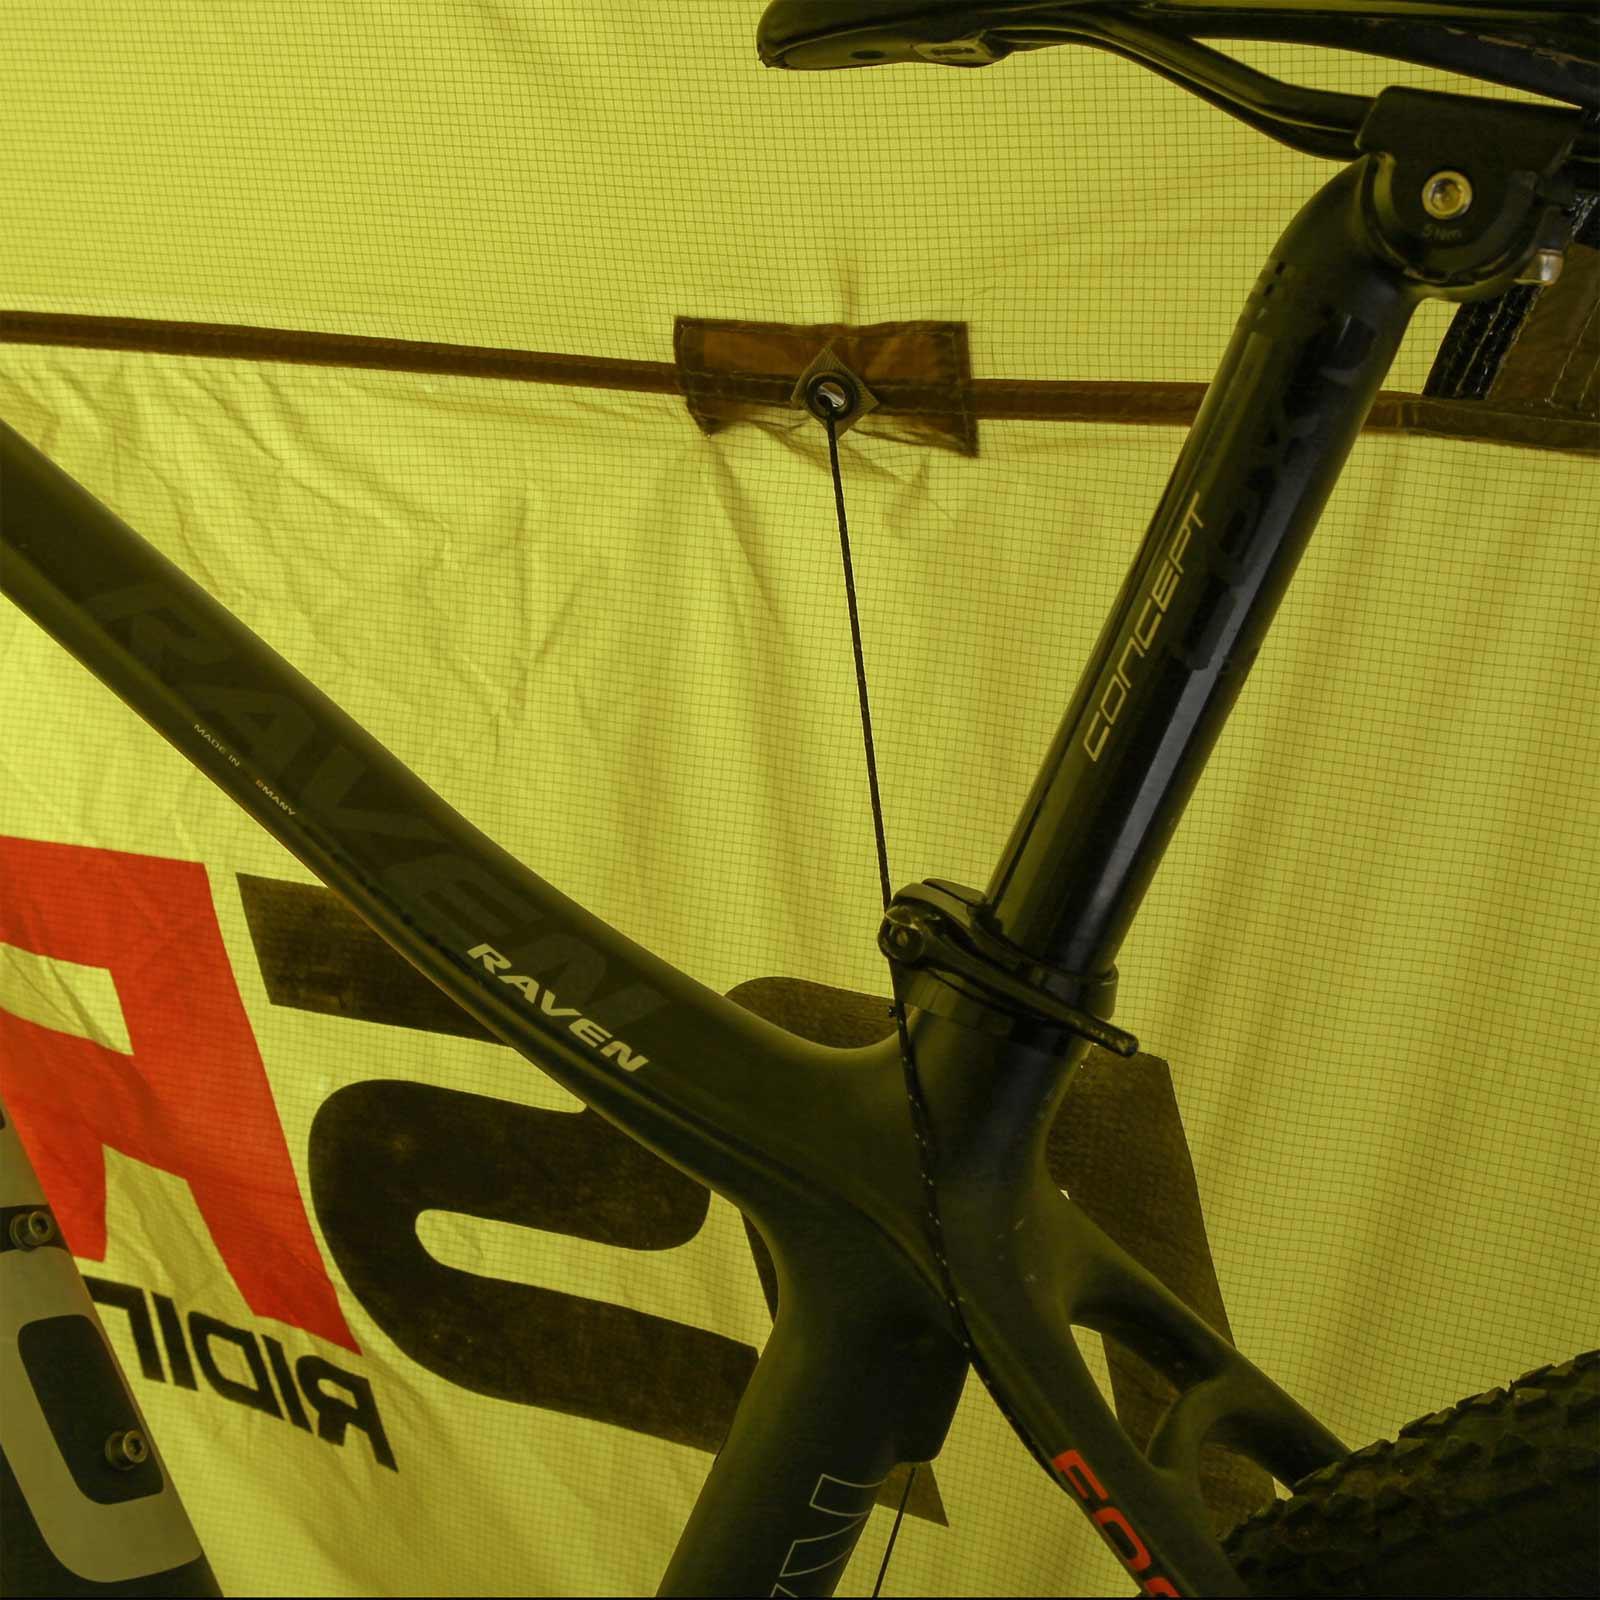 NSR Cycling Biketent 1 Personen Fahrradzelt leichtes Trekking Kuppel Kuppel Kuppel Zelt Bike 24e73a